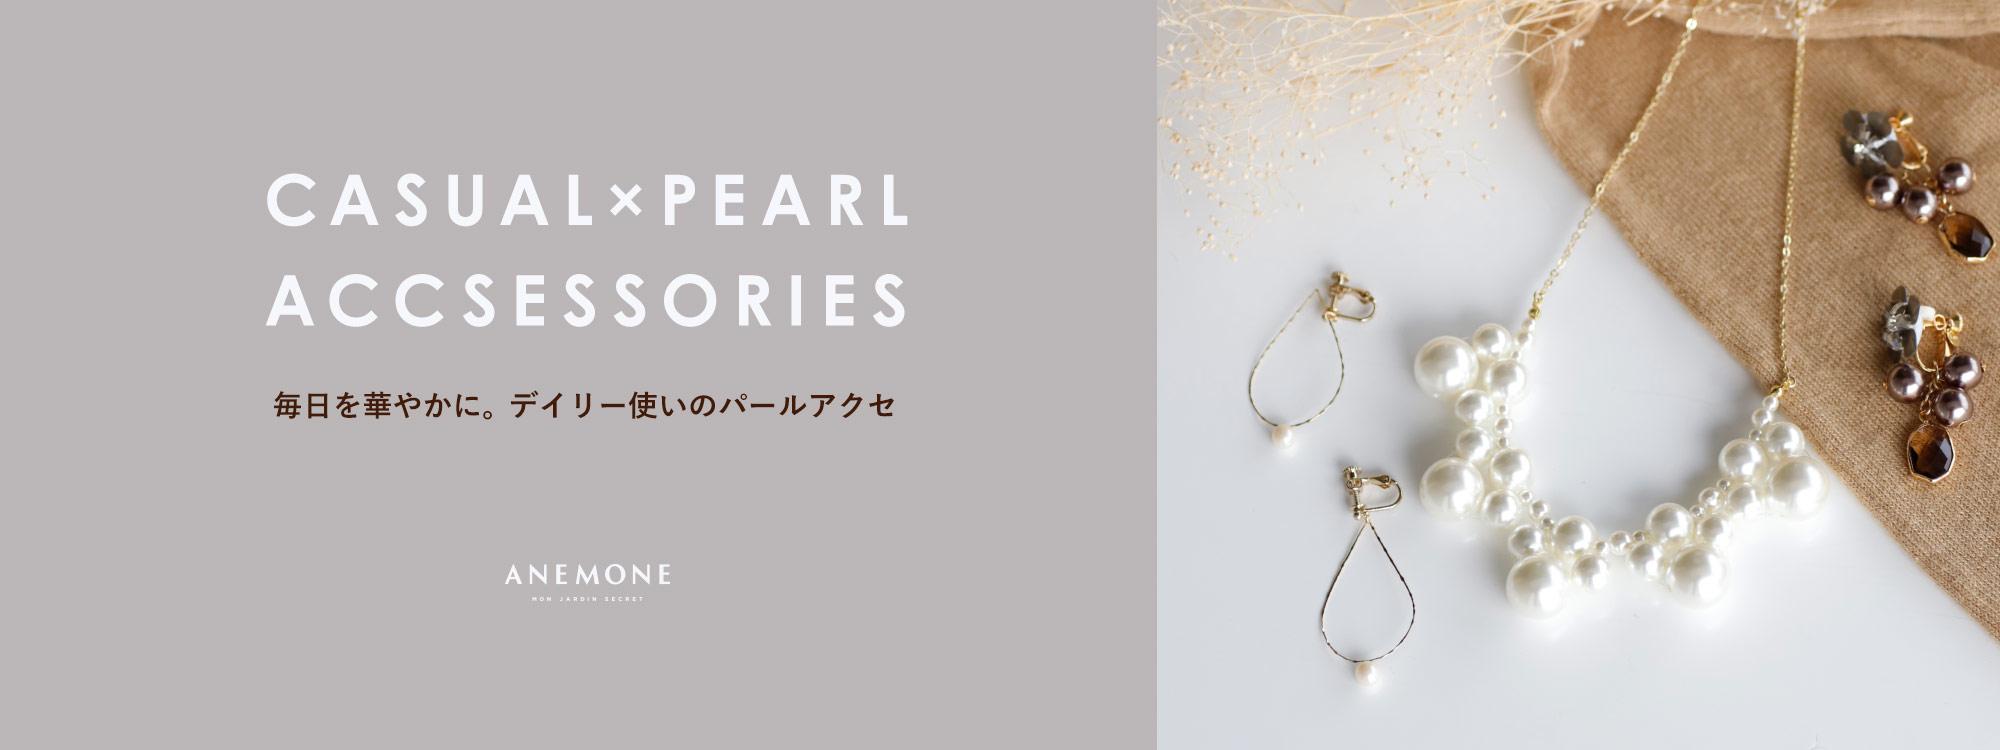 Pearl Accessories <br>-毎日を華やかに。デイリー使いのパールアクセ-